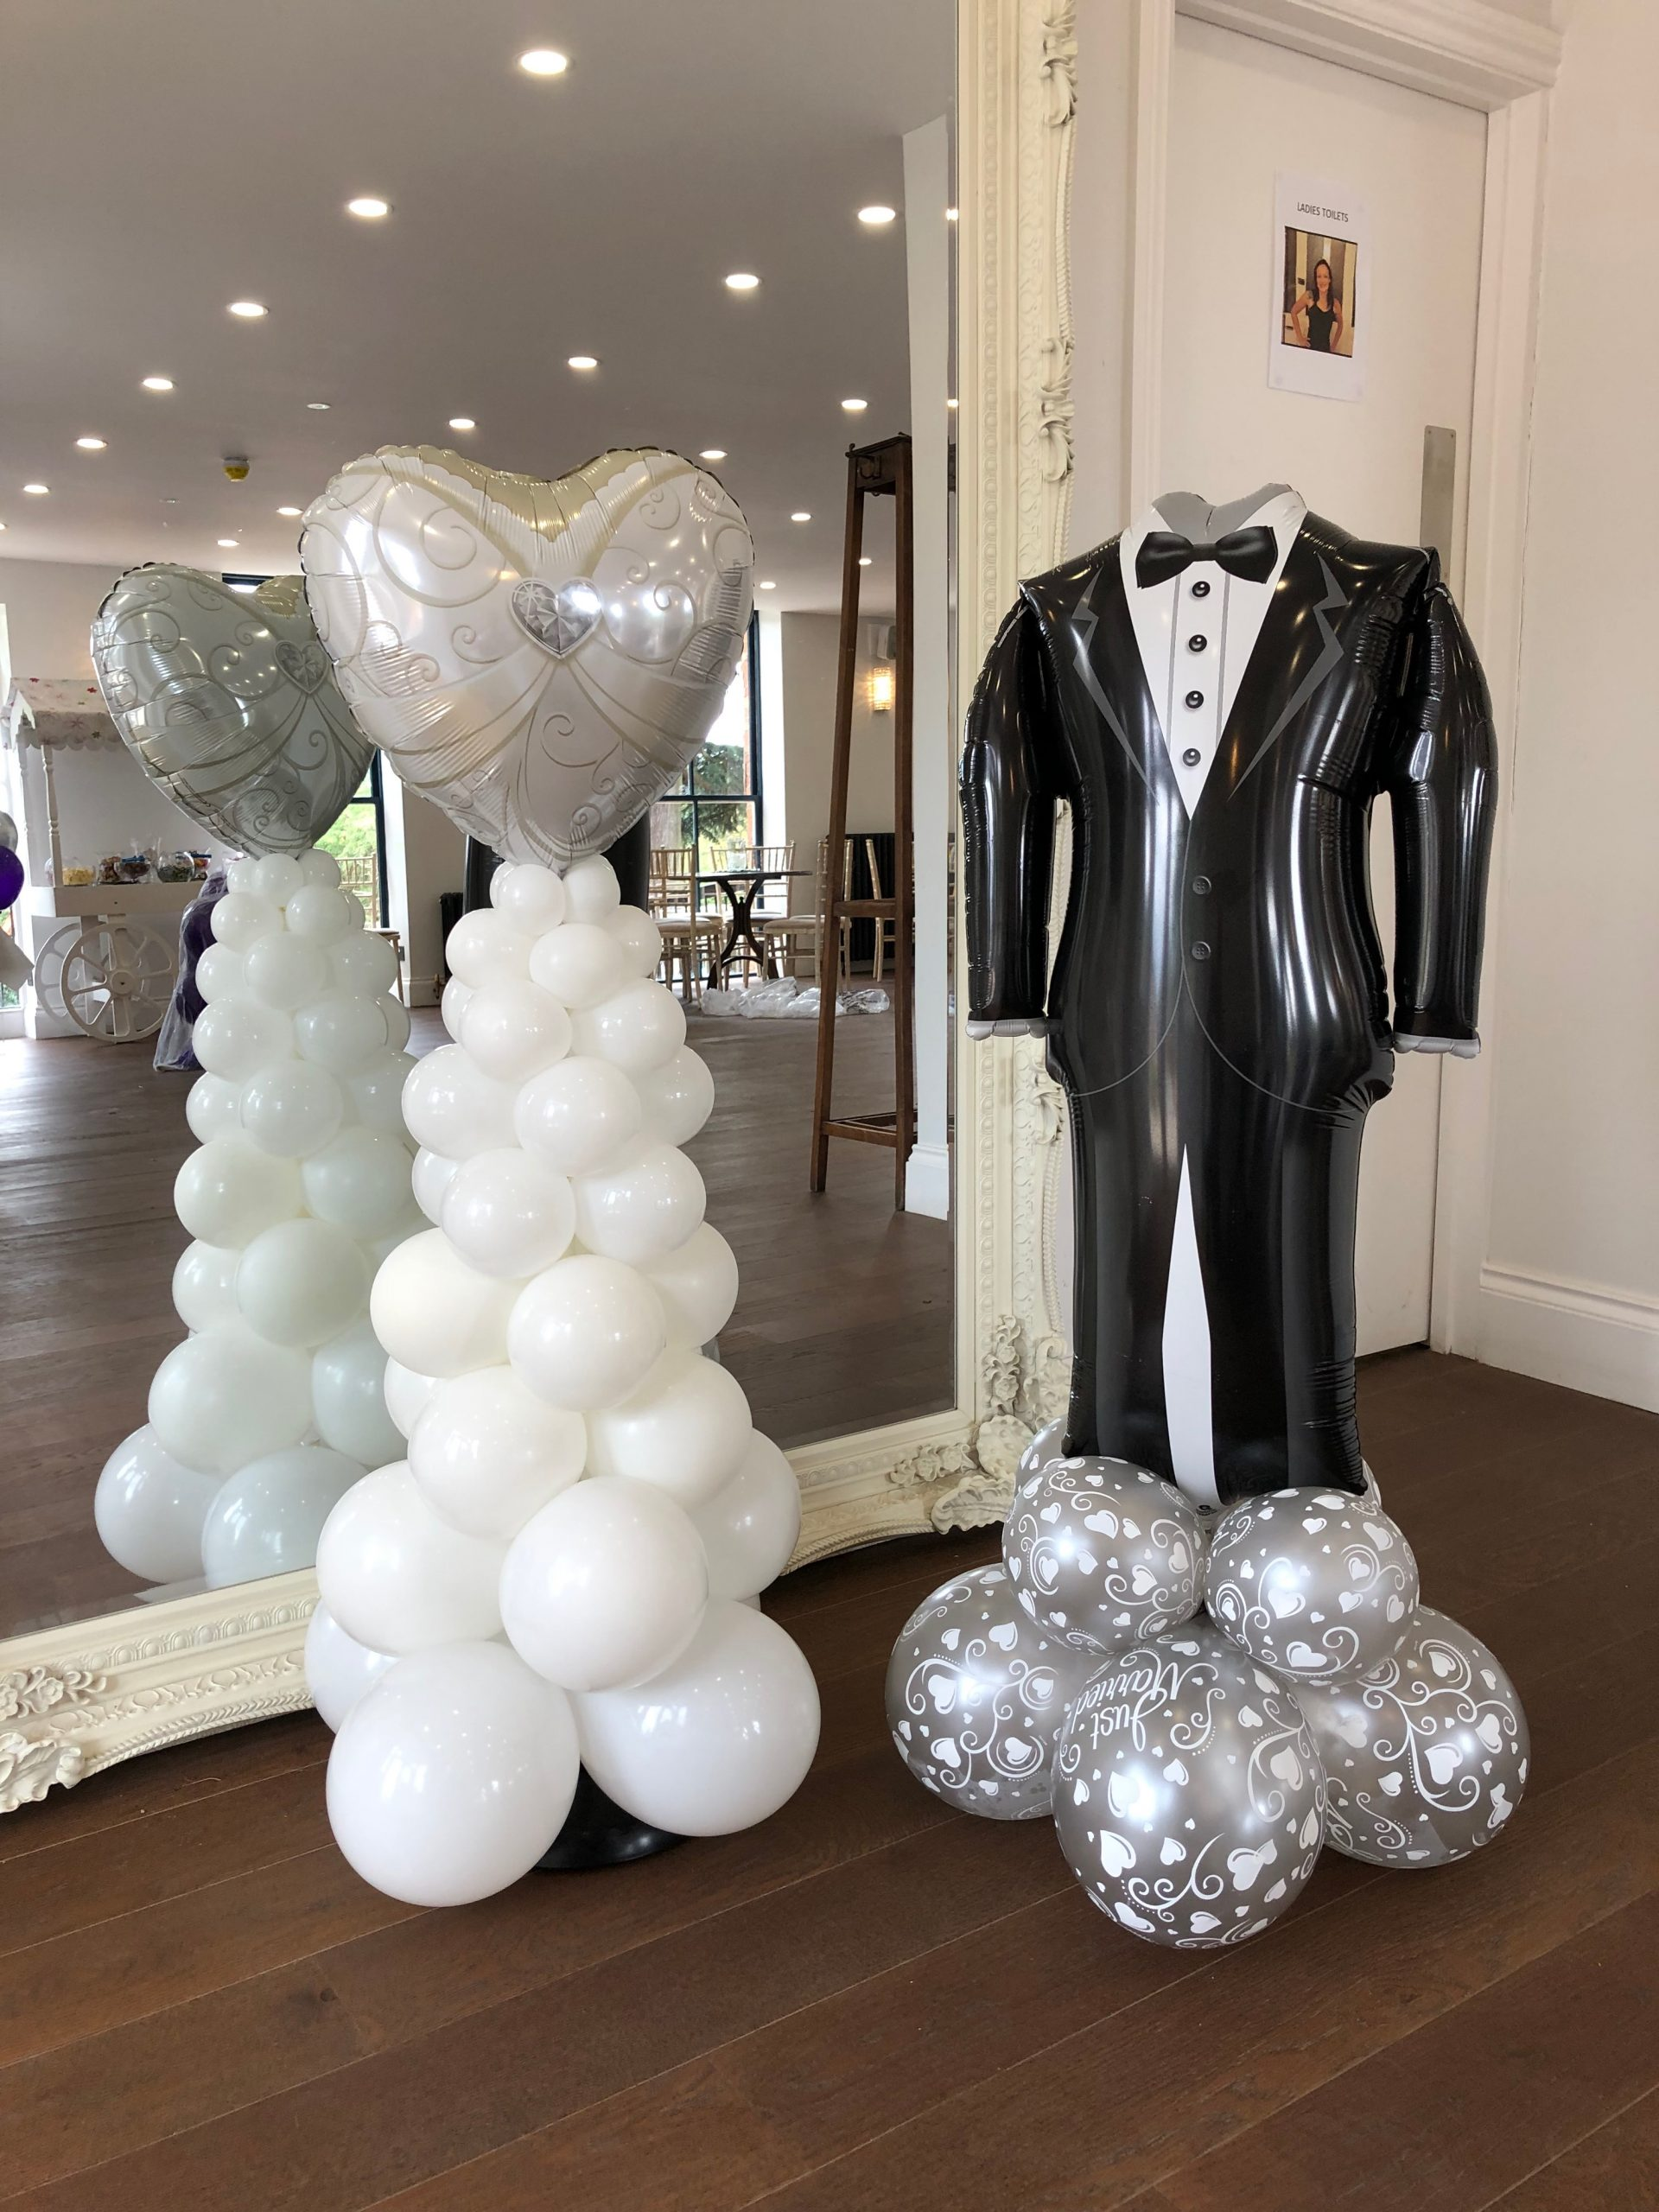 Bride and groom balloon columns